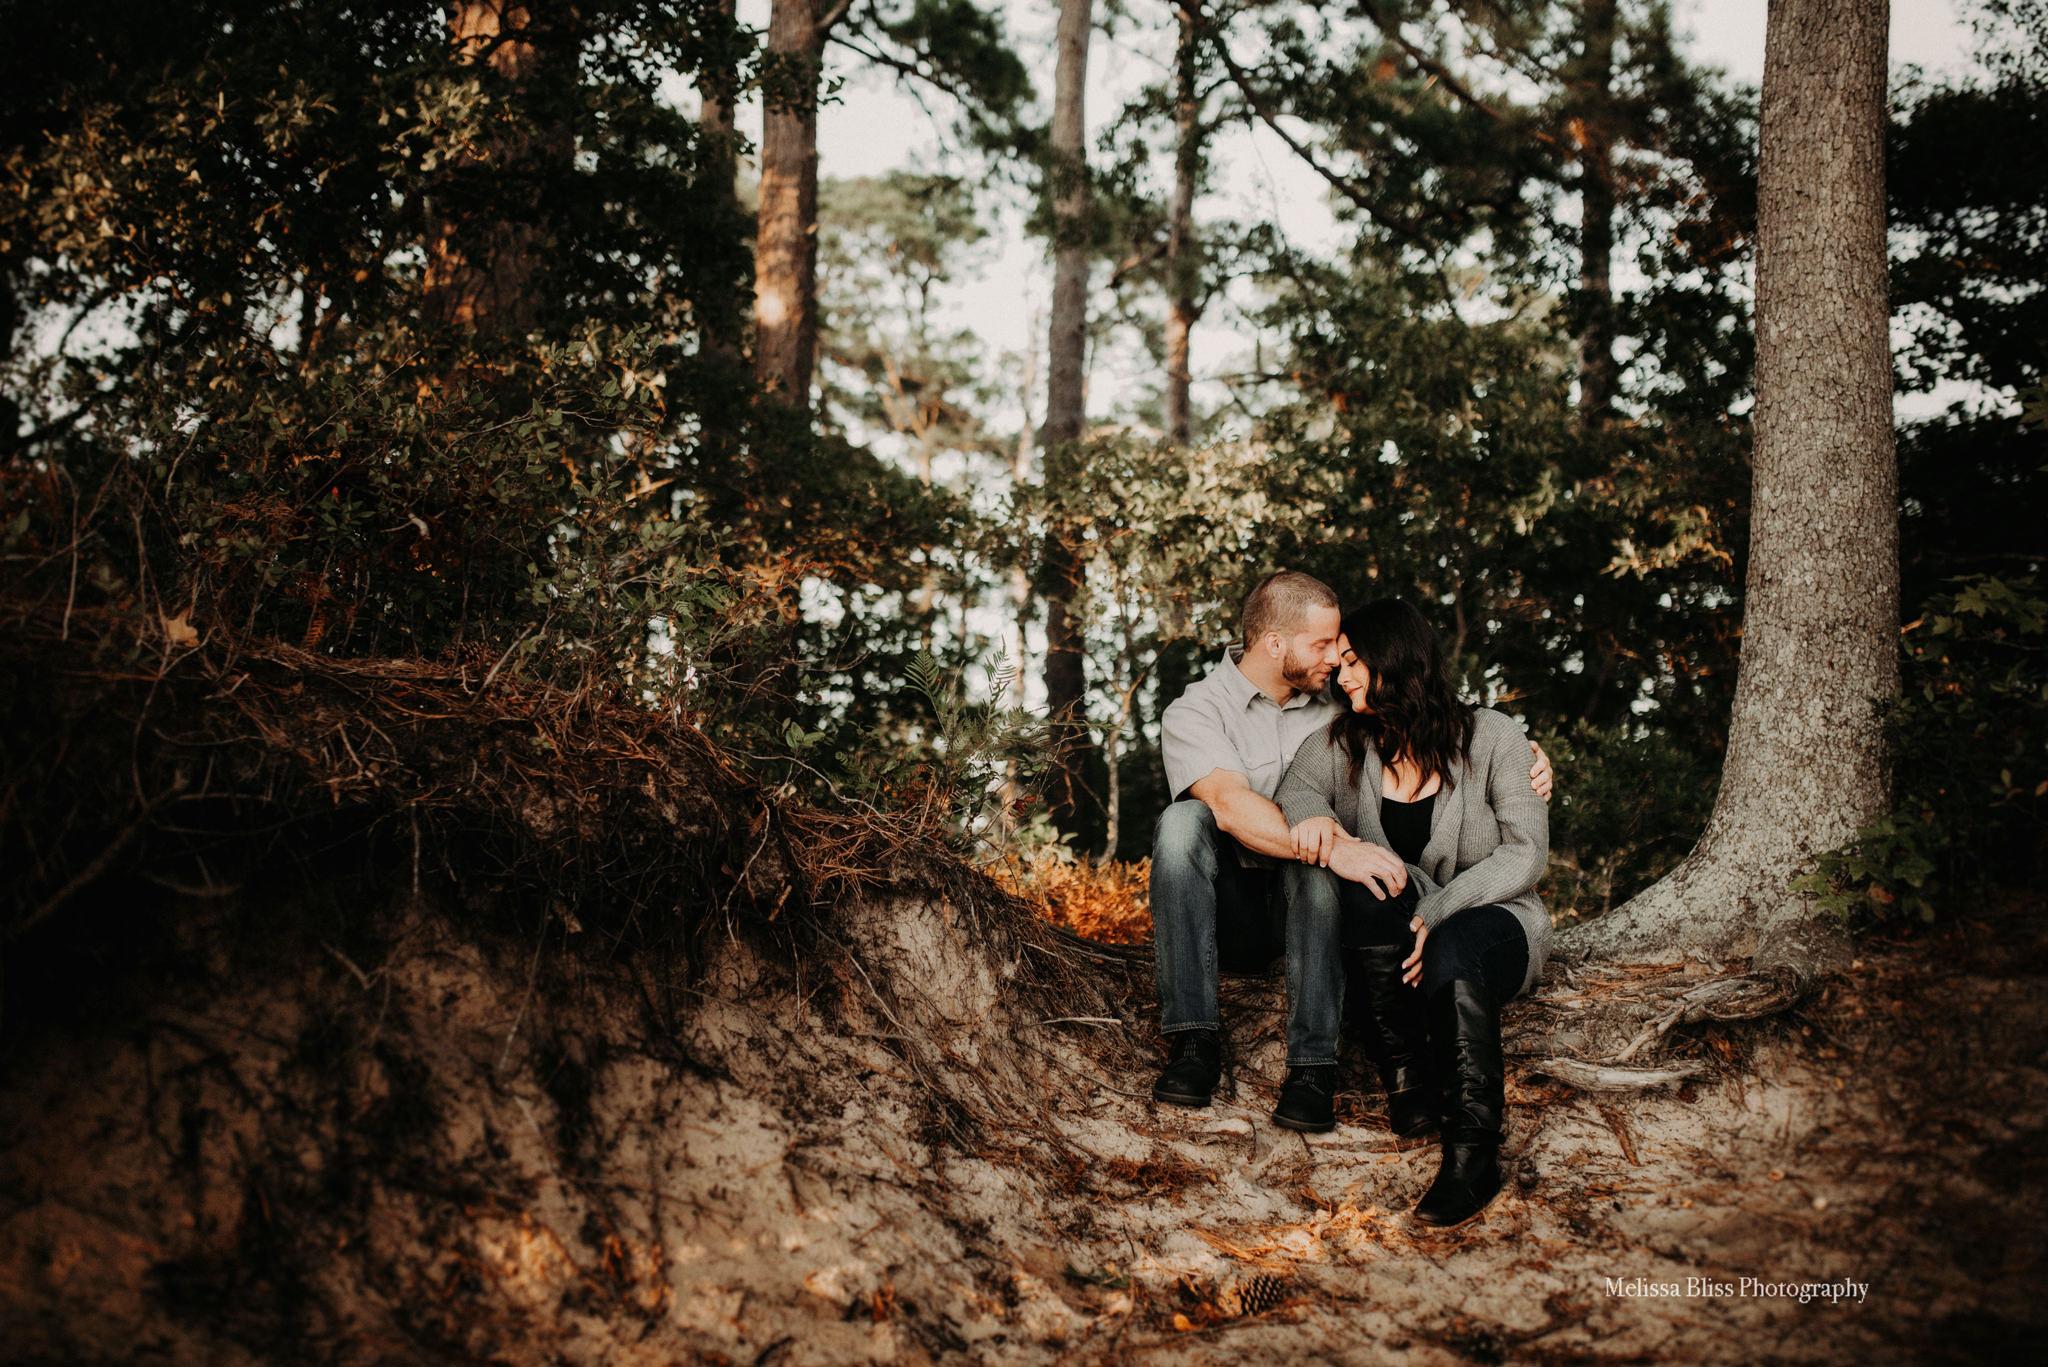 norfolk-engagement-photographer-melissa-bliss-photography-creative-wedding-and-engagement-photos-va-beach-norfolk-richmond-va.jpg